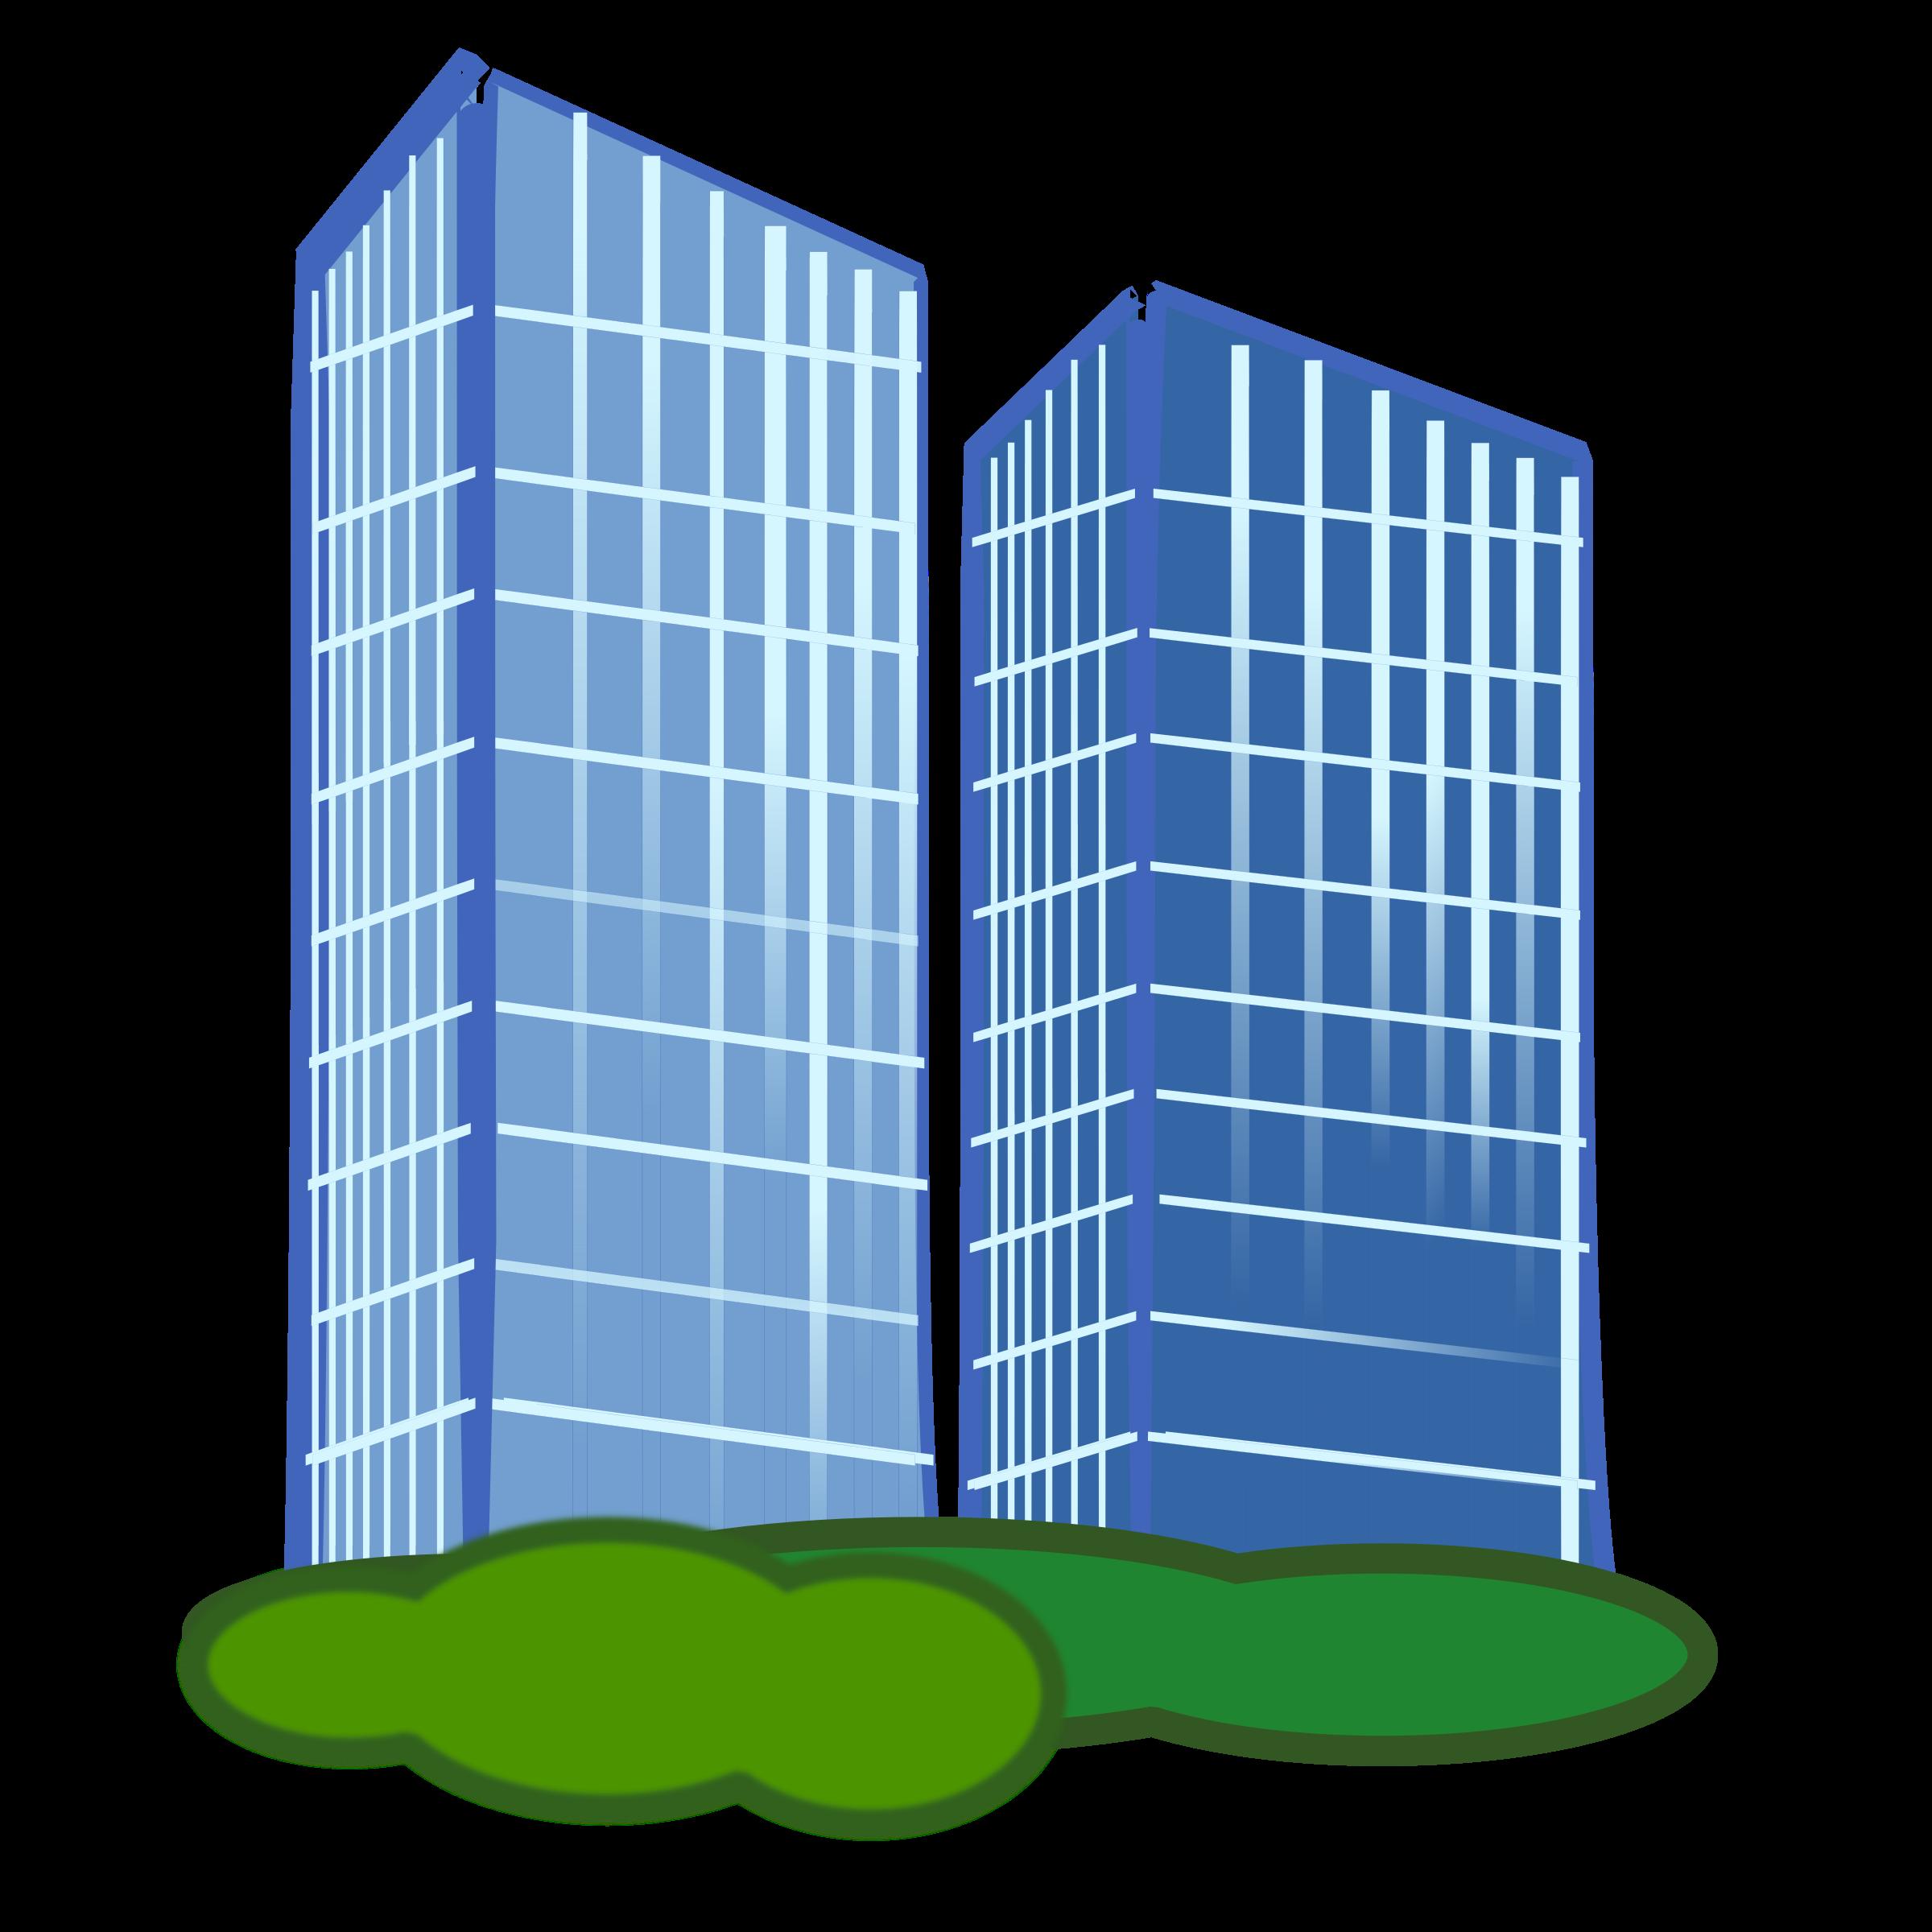 Skyscraper clipart apartment building Apartment icon icon Apartment 64x64